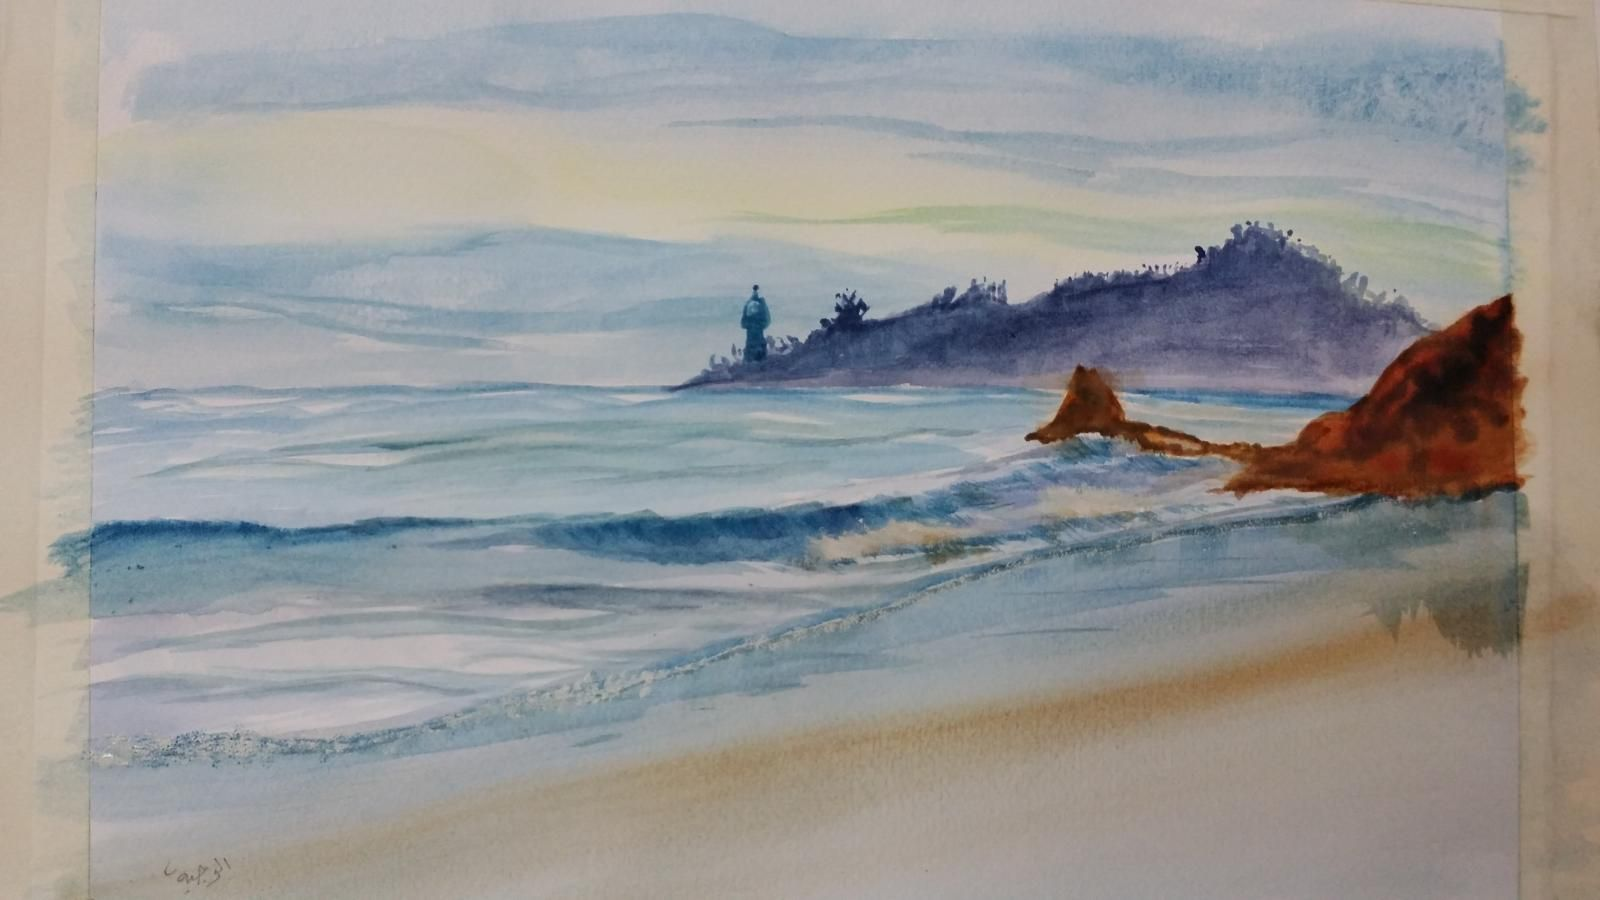 #moodyzone #art #arts #see #water_color #watercolr   moodyzone.com - Member Home Page